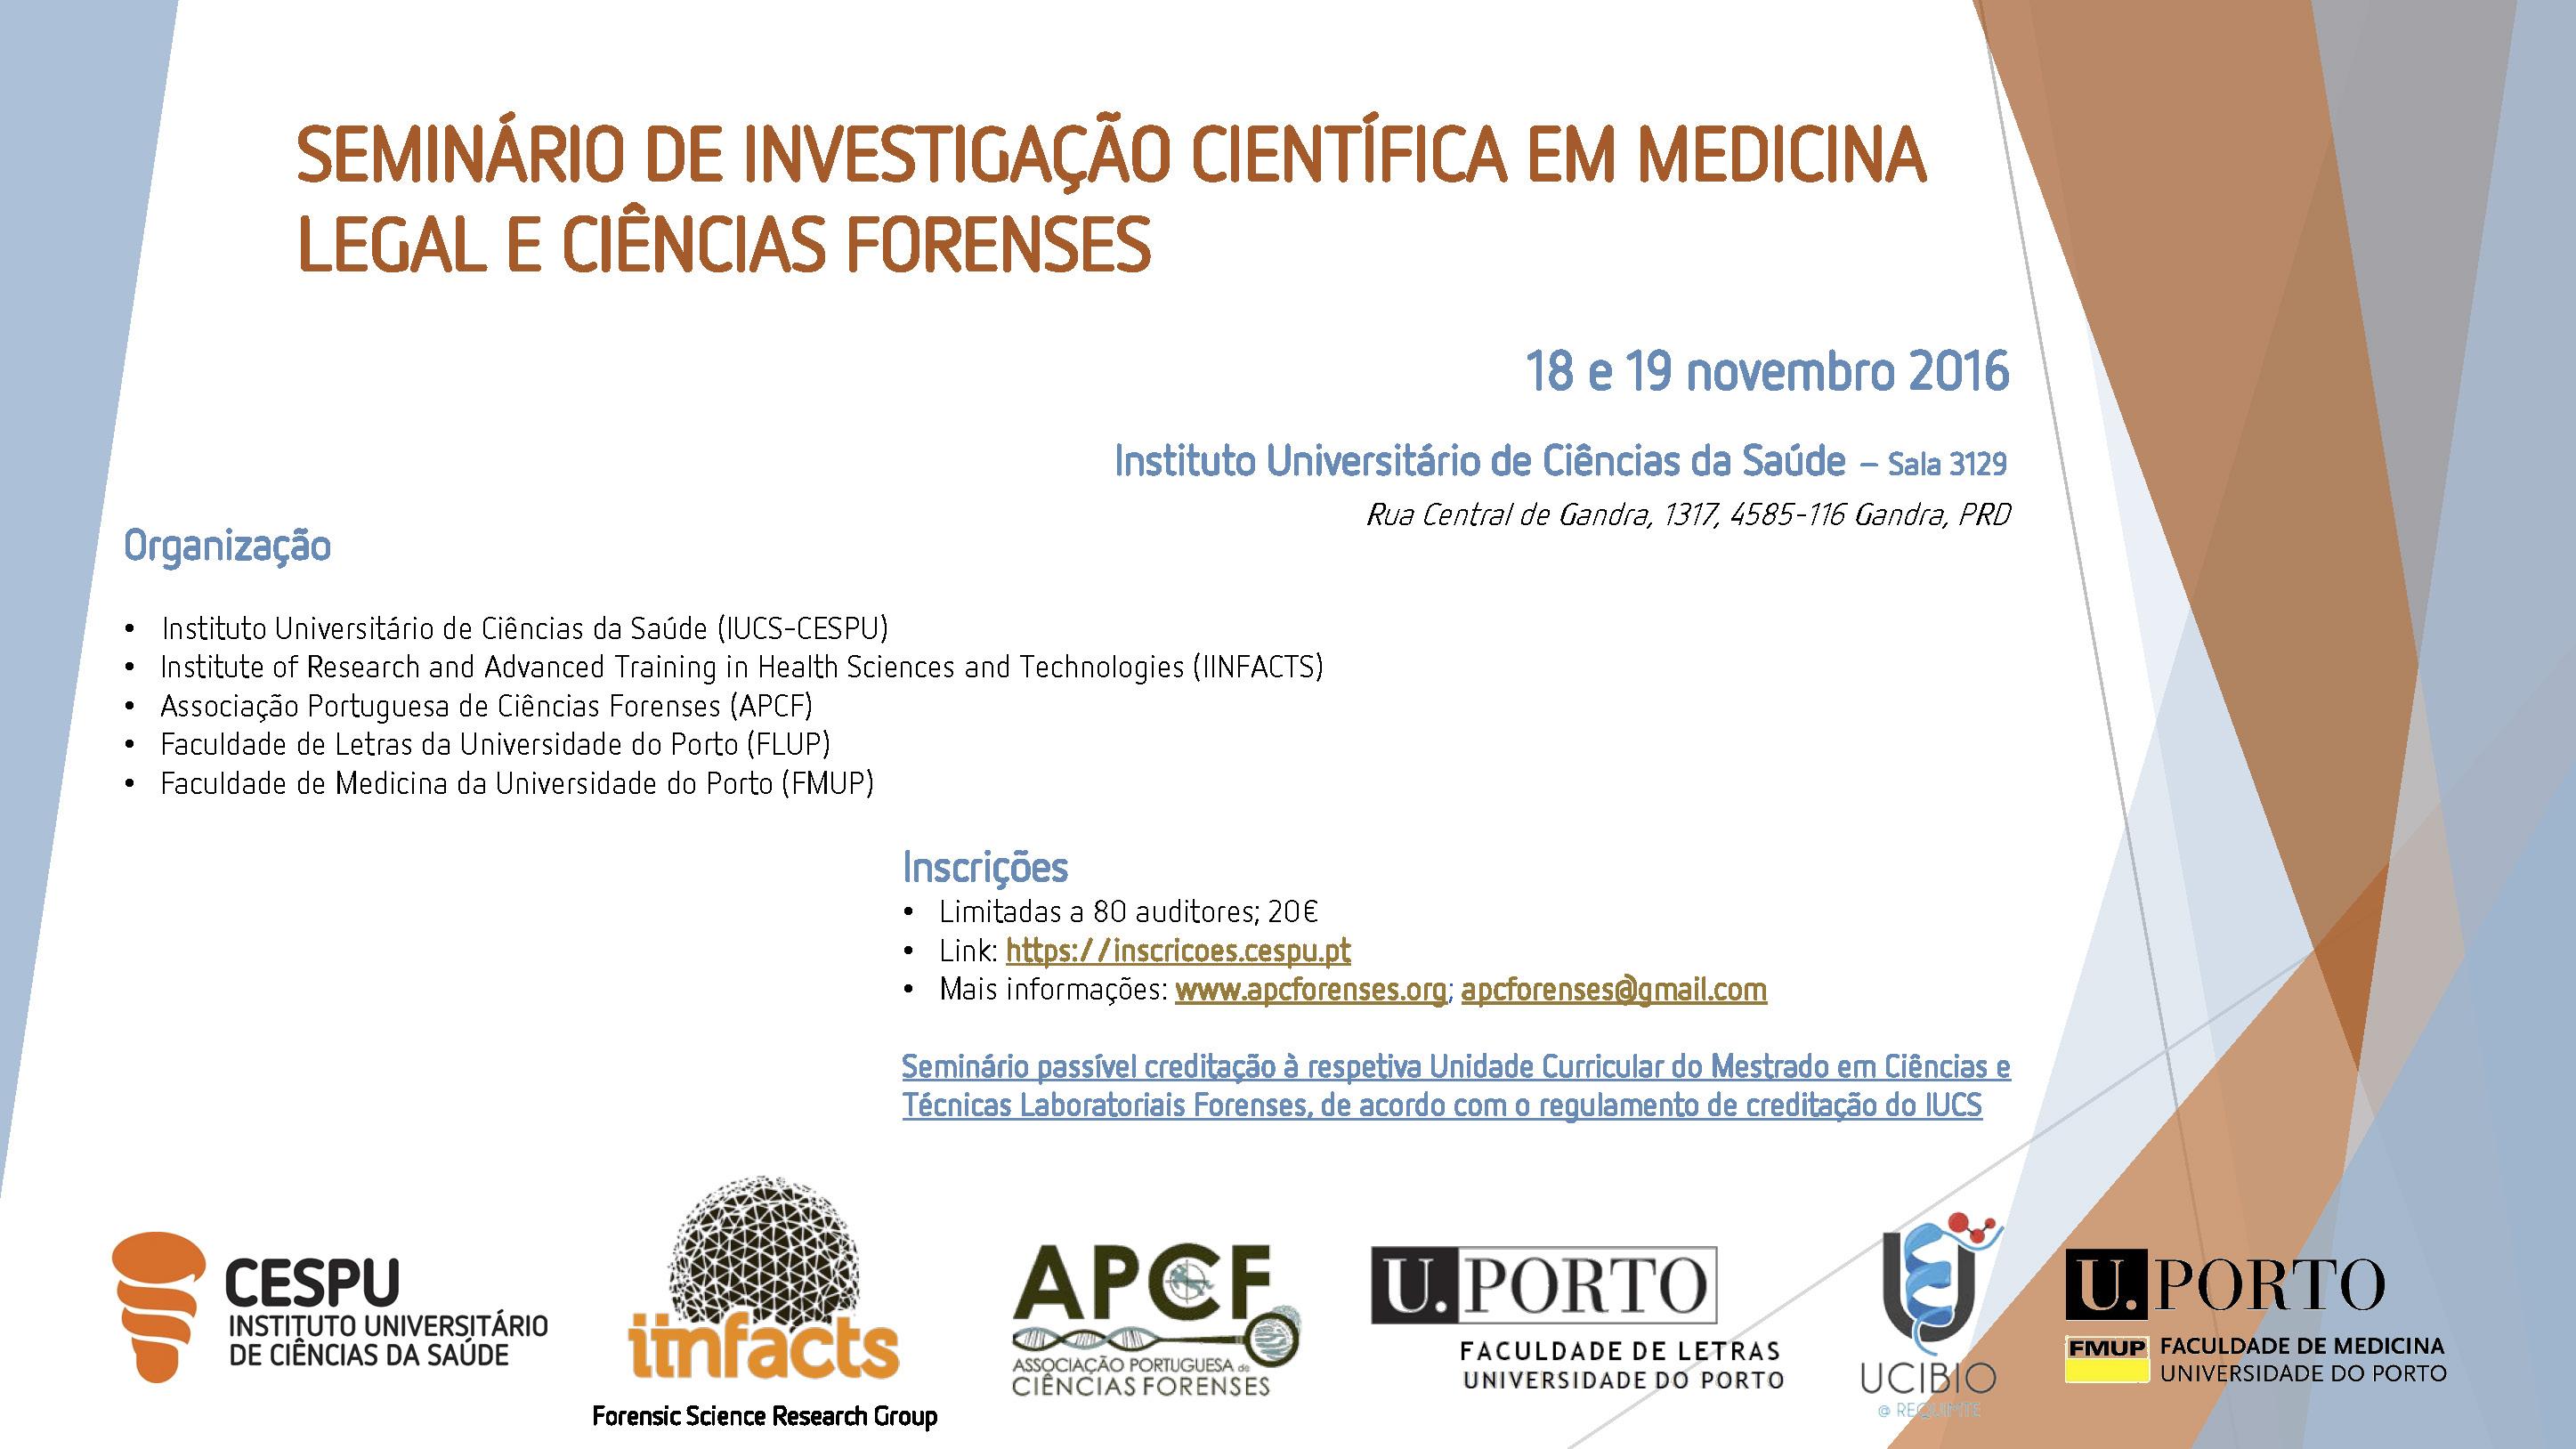 seminario-de-investigacao-cientifica-em-medicina-legal-e-ciencias-forenses_pagina_1